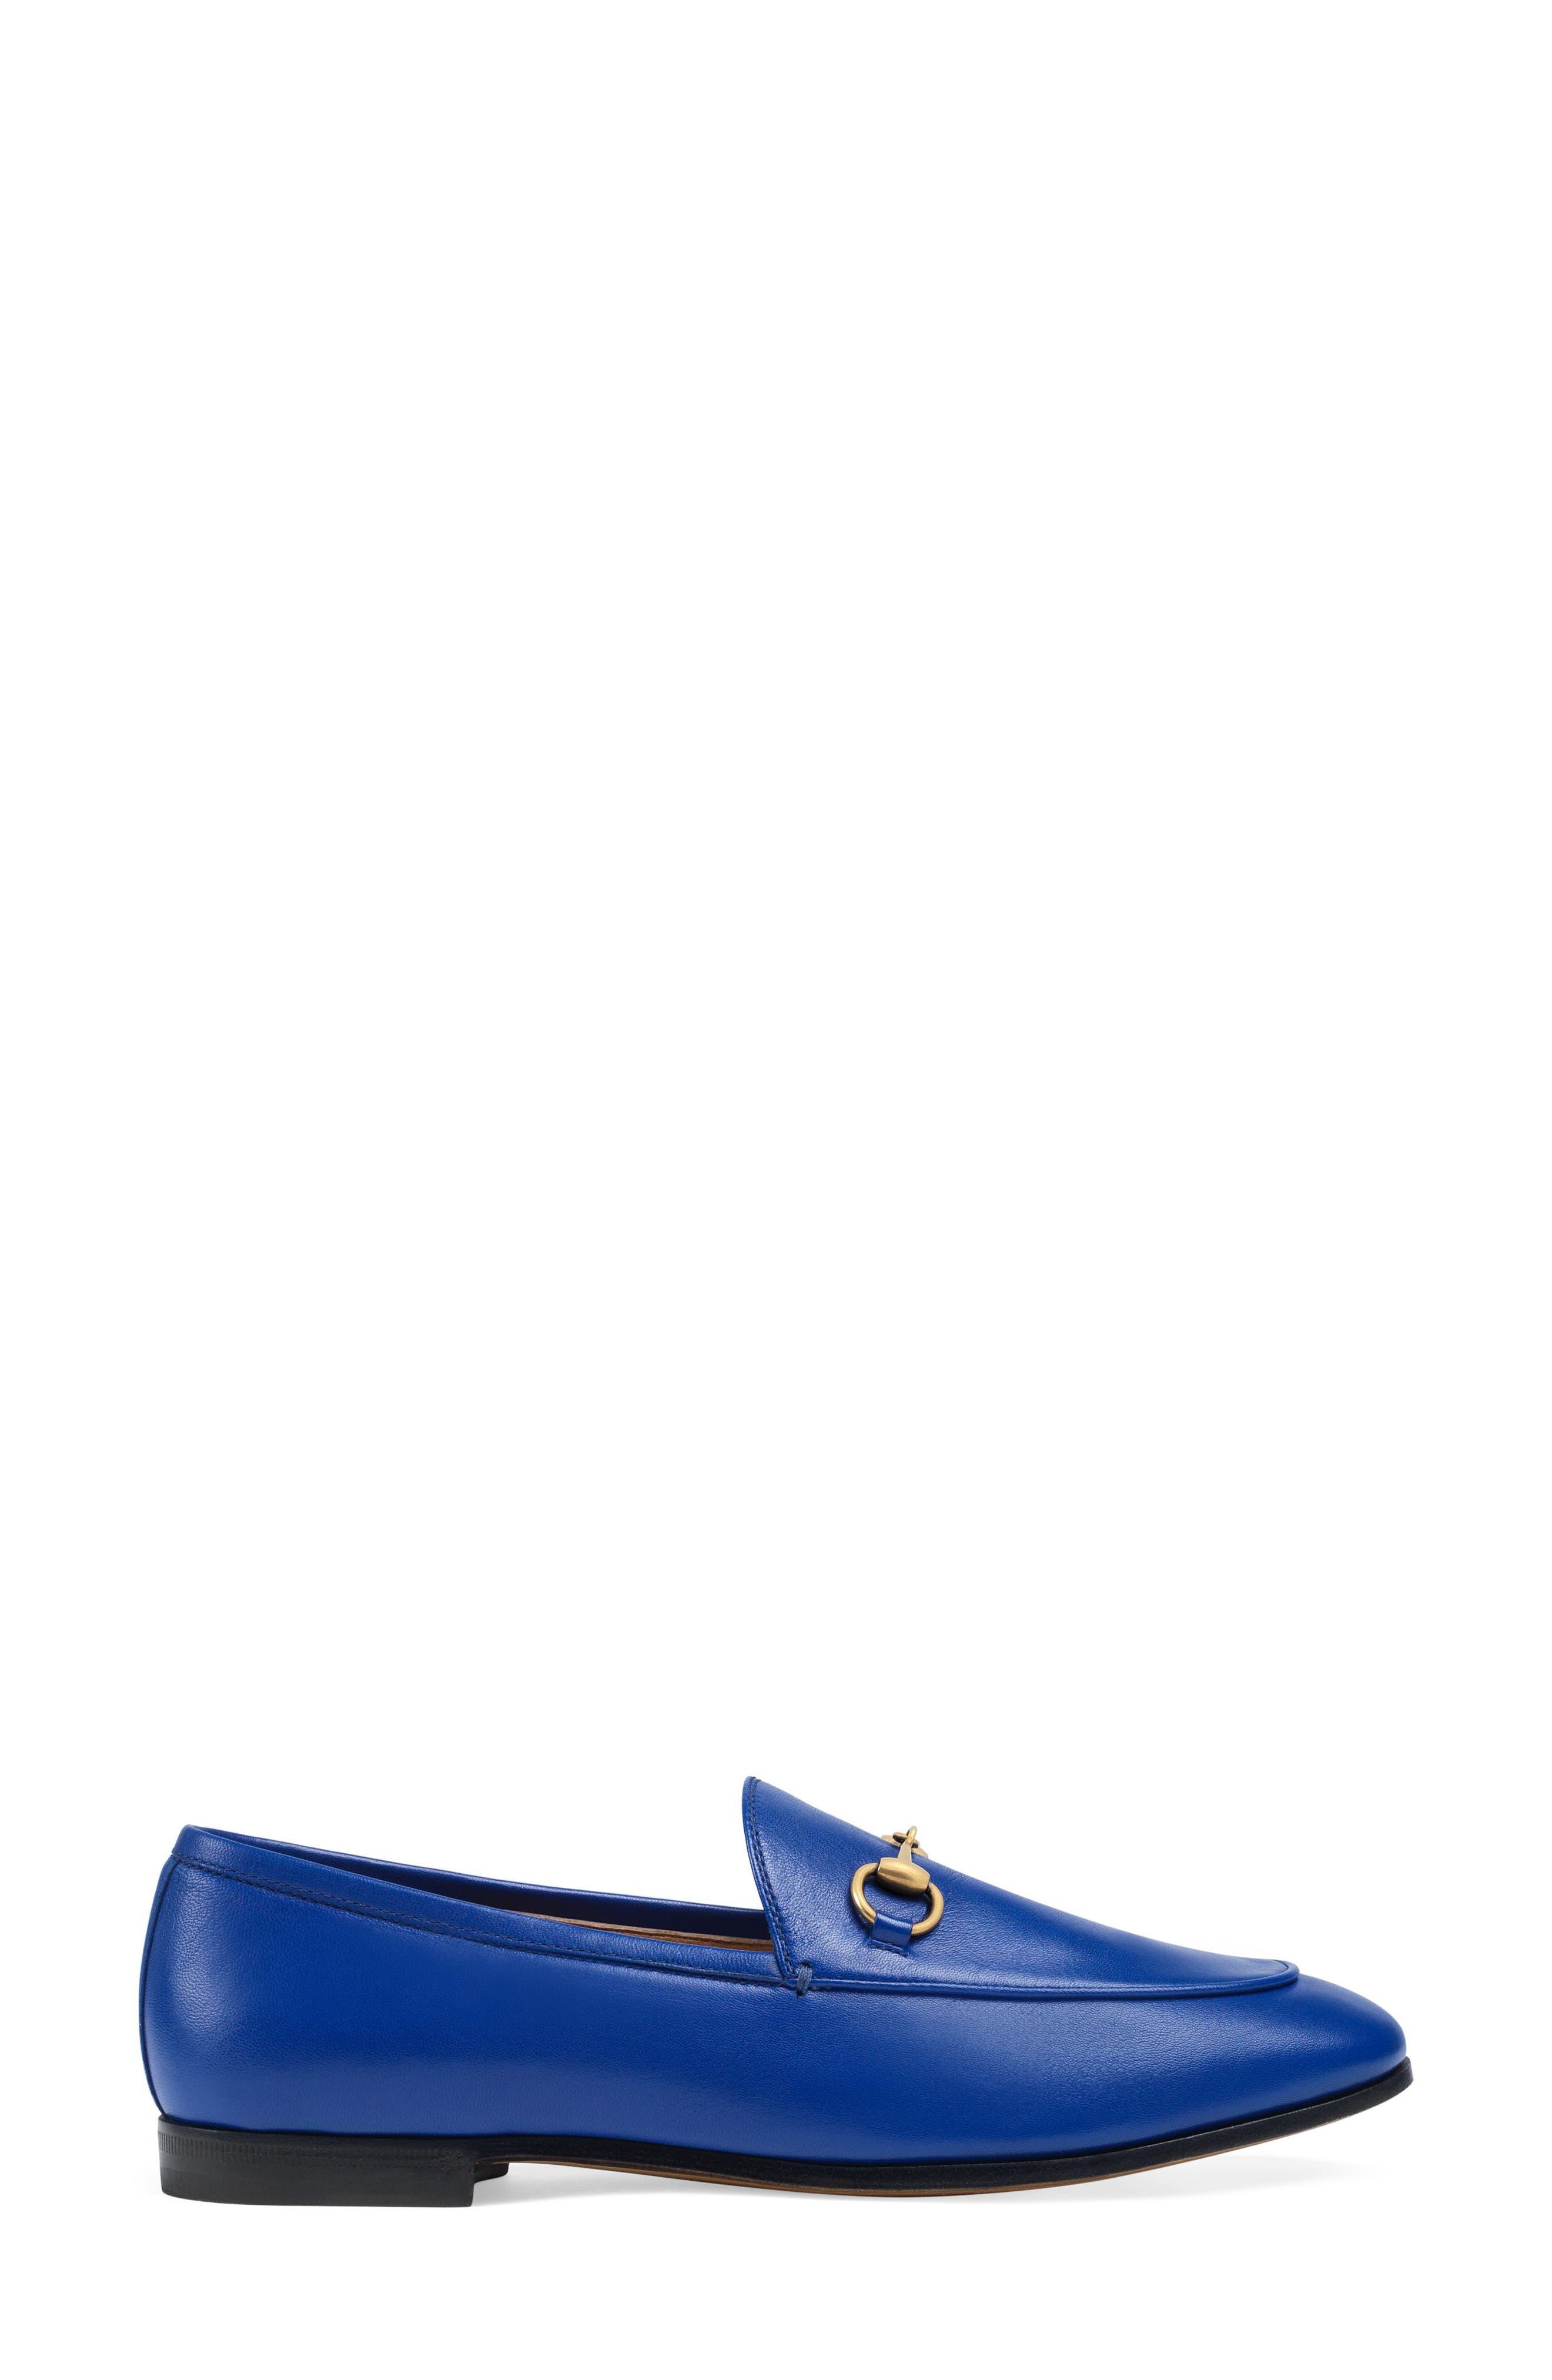 'Jordaan' Loafer,                             Alternate thumbnail 2, color,                             ELECTRIC BLUE